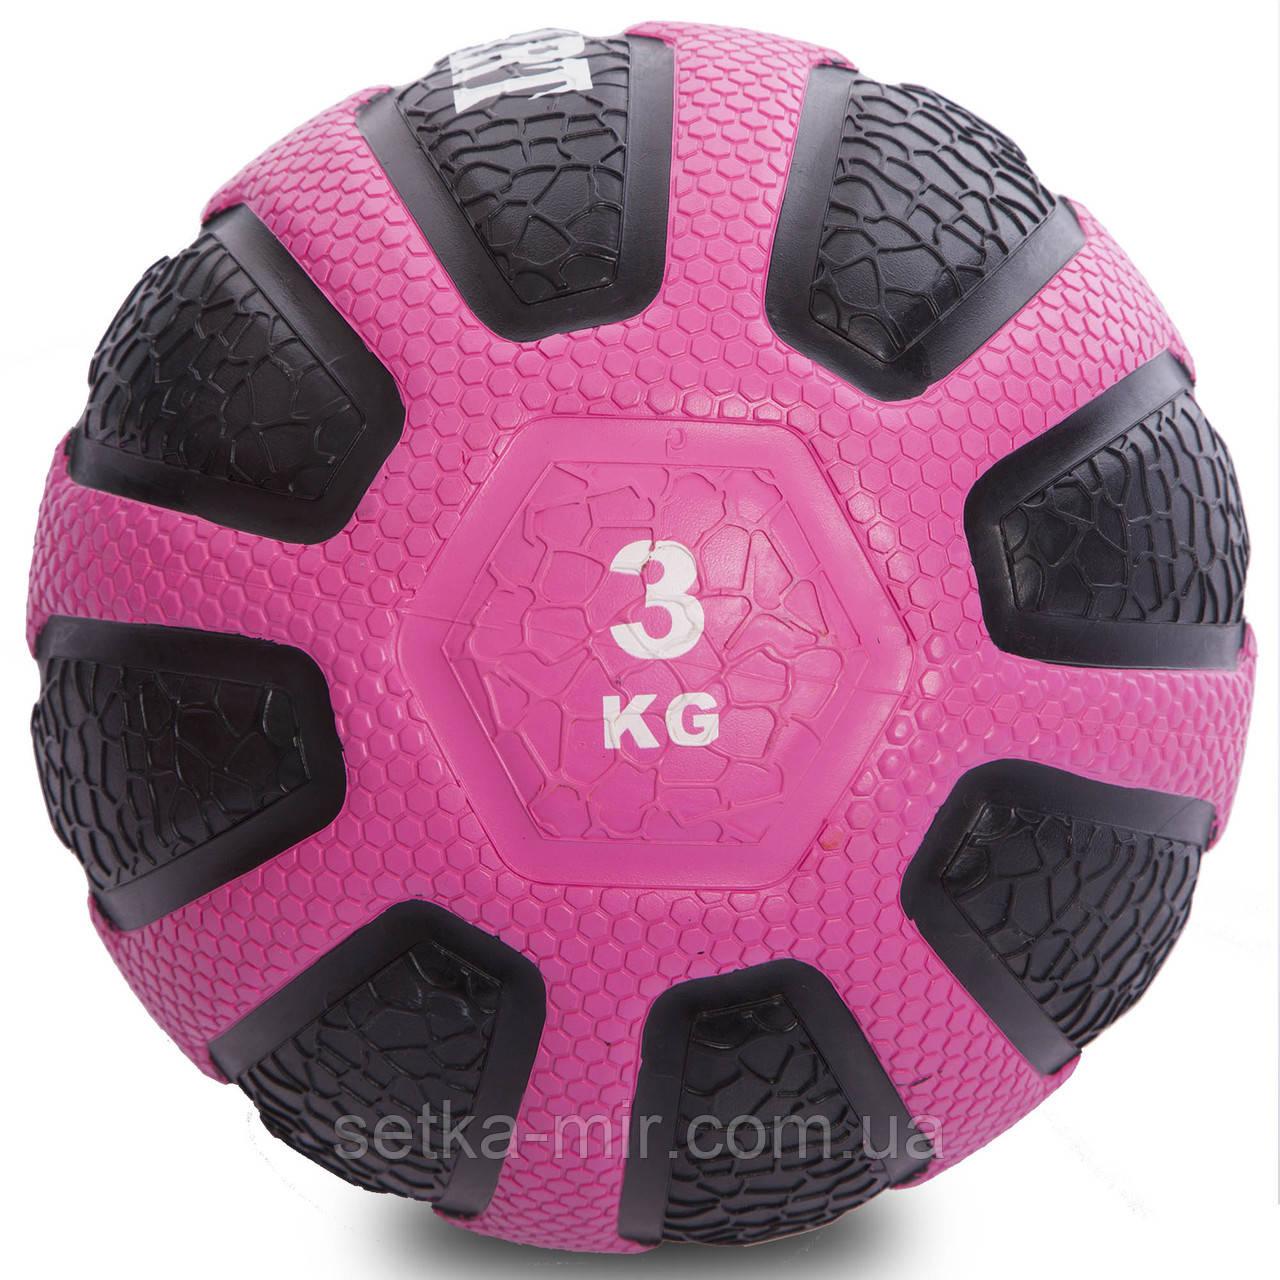 М'яч медичний медбол Zelart Medicine Ball FI-0898-3 3 кг